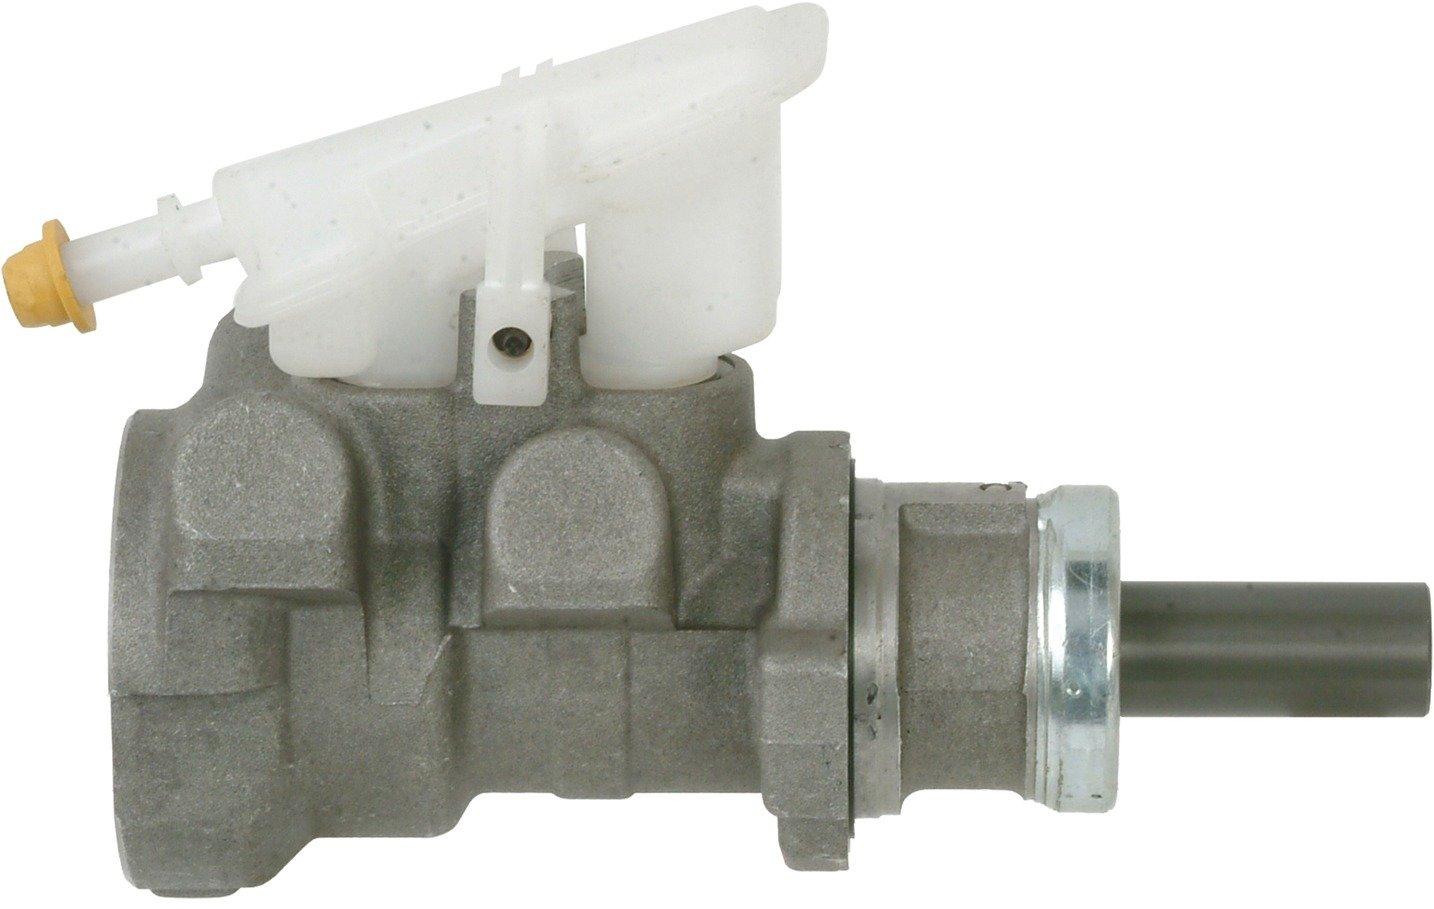 Cardone Select 13-2983 New Brake Master Cylinder by Cardone Select